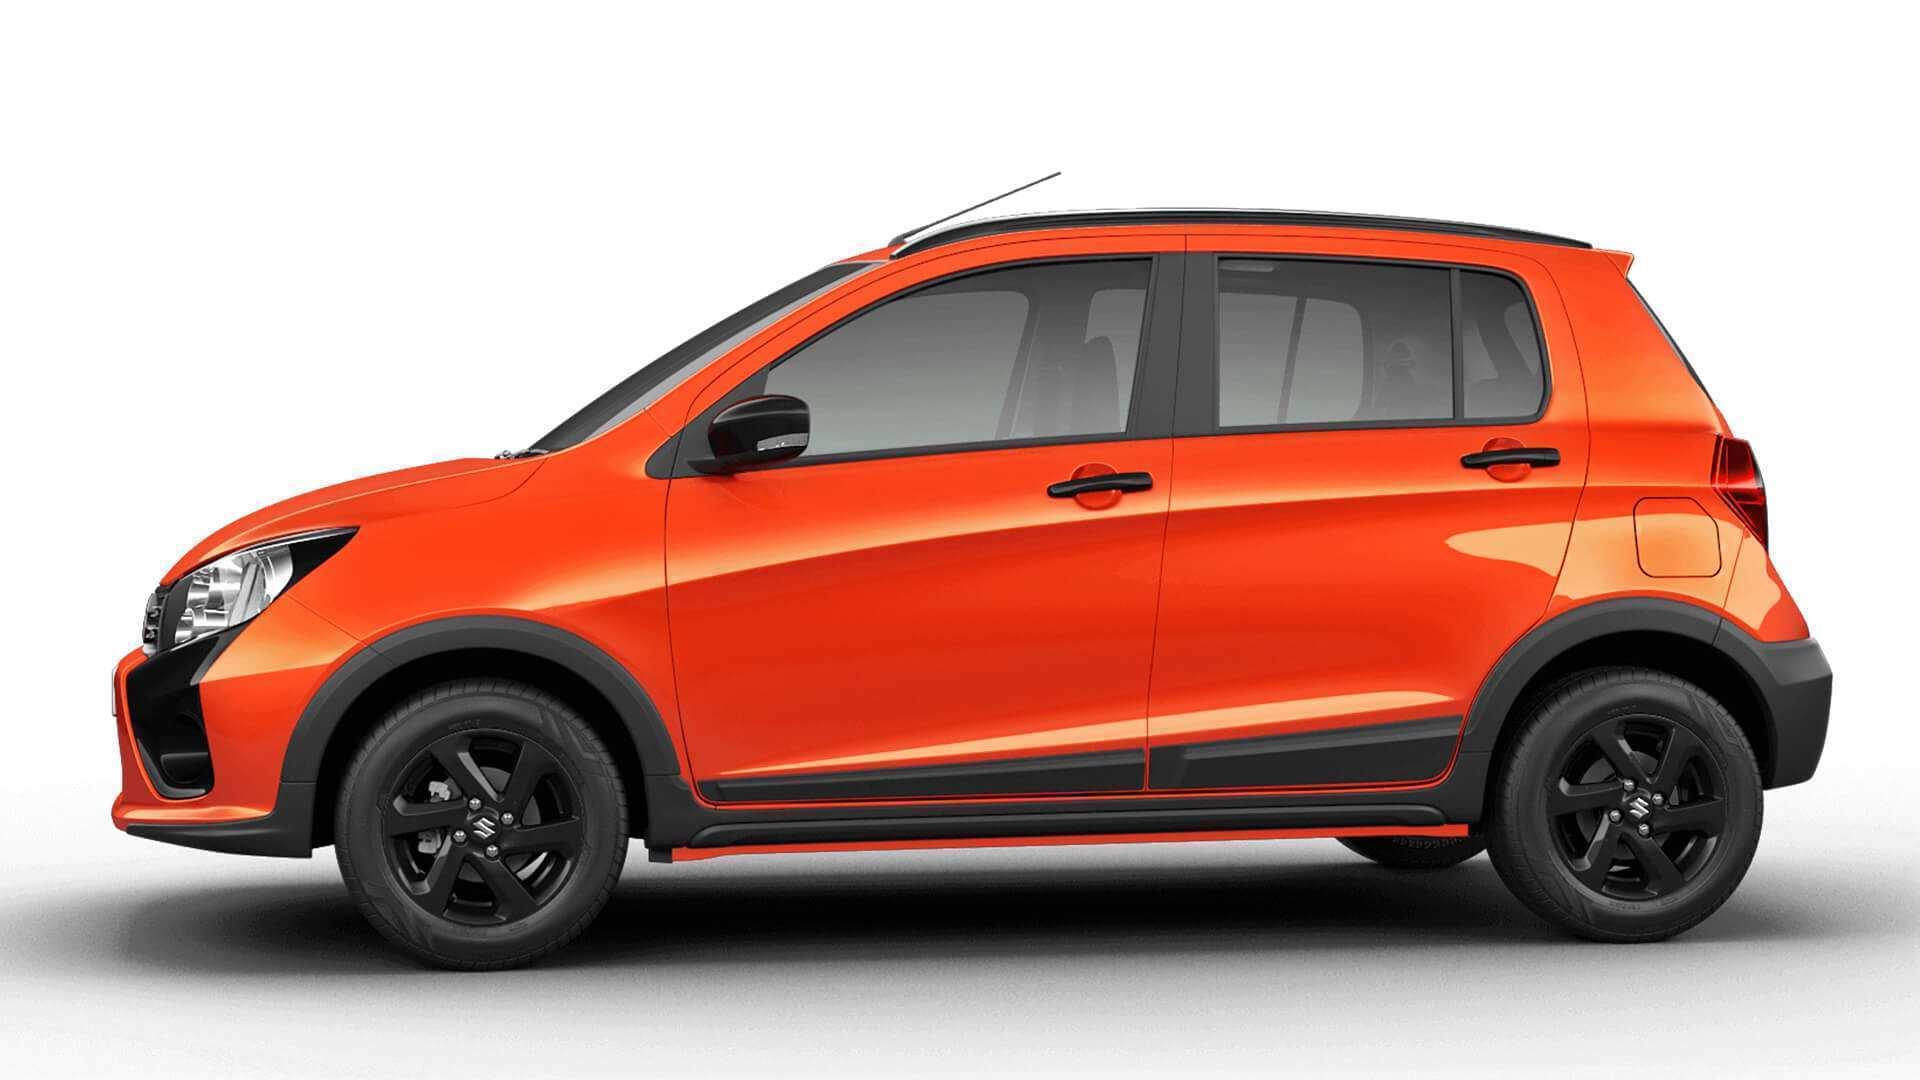 32 All New Suzuki Celerio 2020 Exterior and Interior by Suzuki Celerio 2020